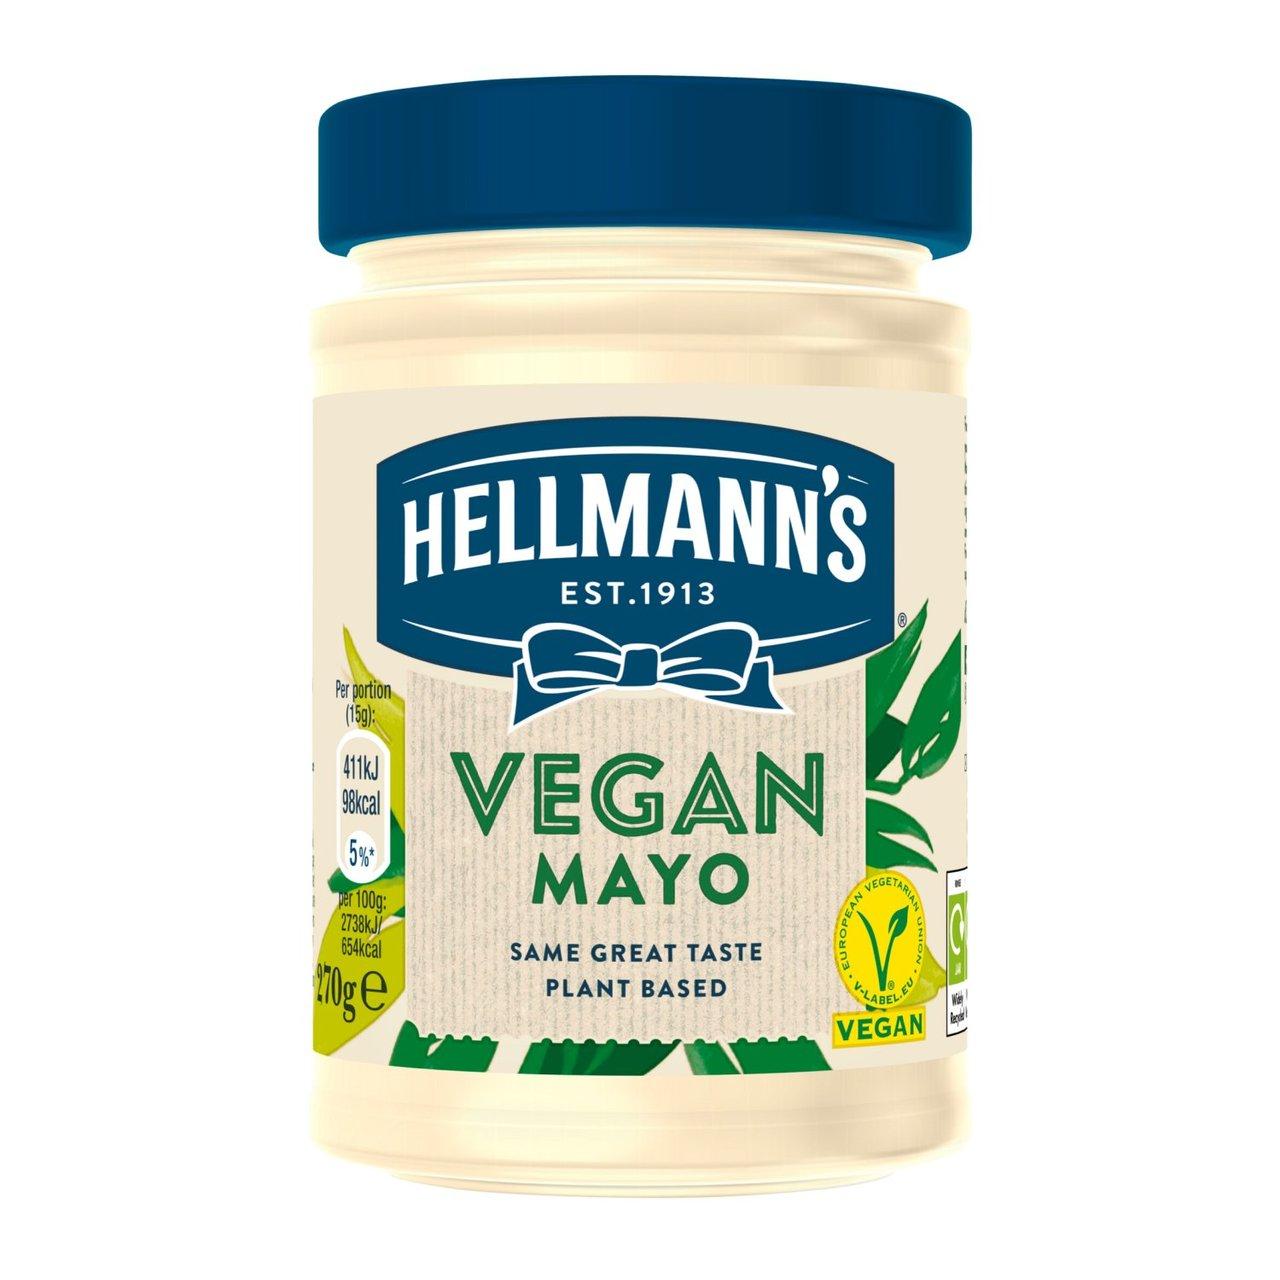 Hellmann's Vegan Mayonnaise 280ml - £1.80 @ Morrisons